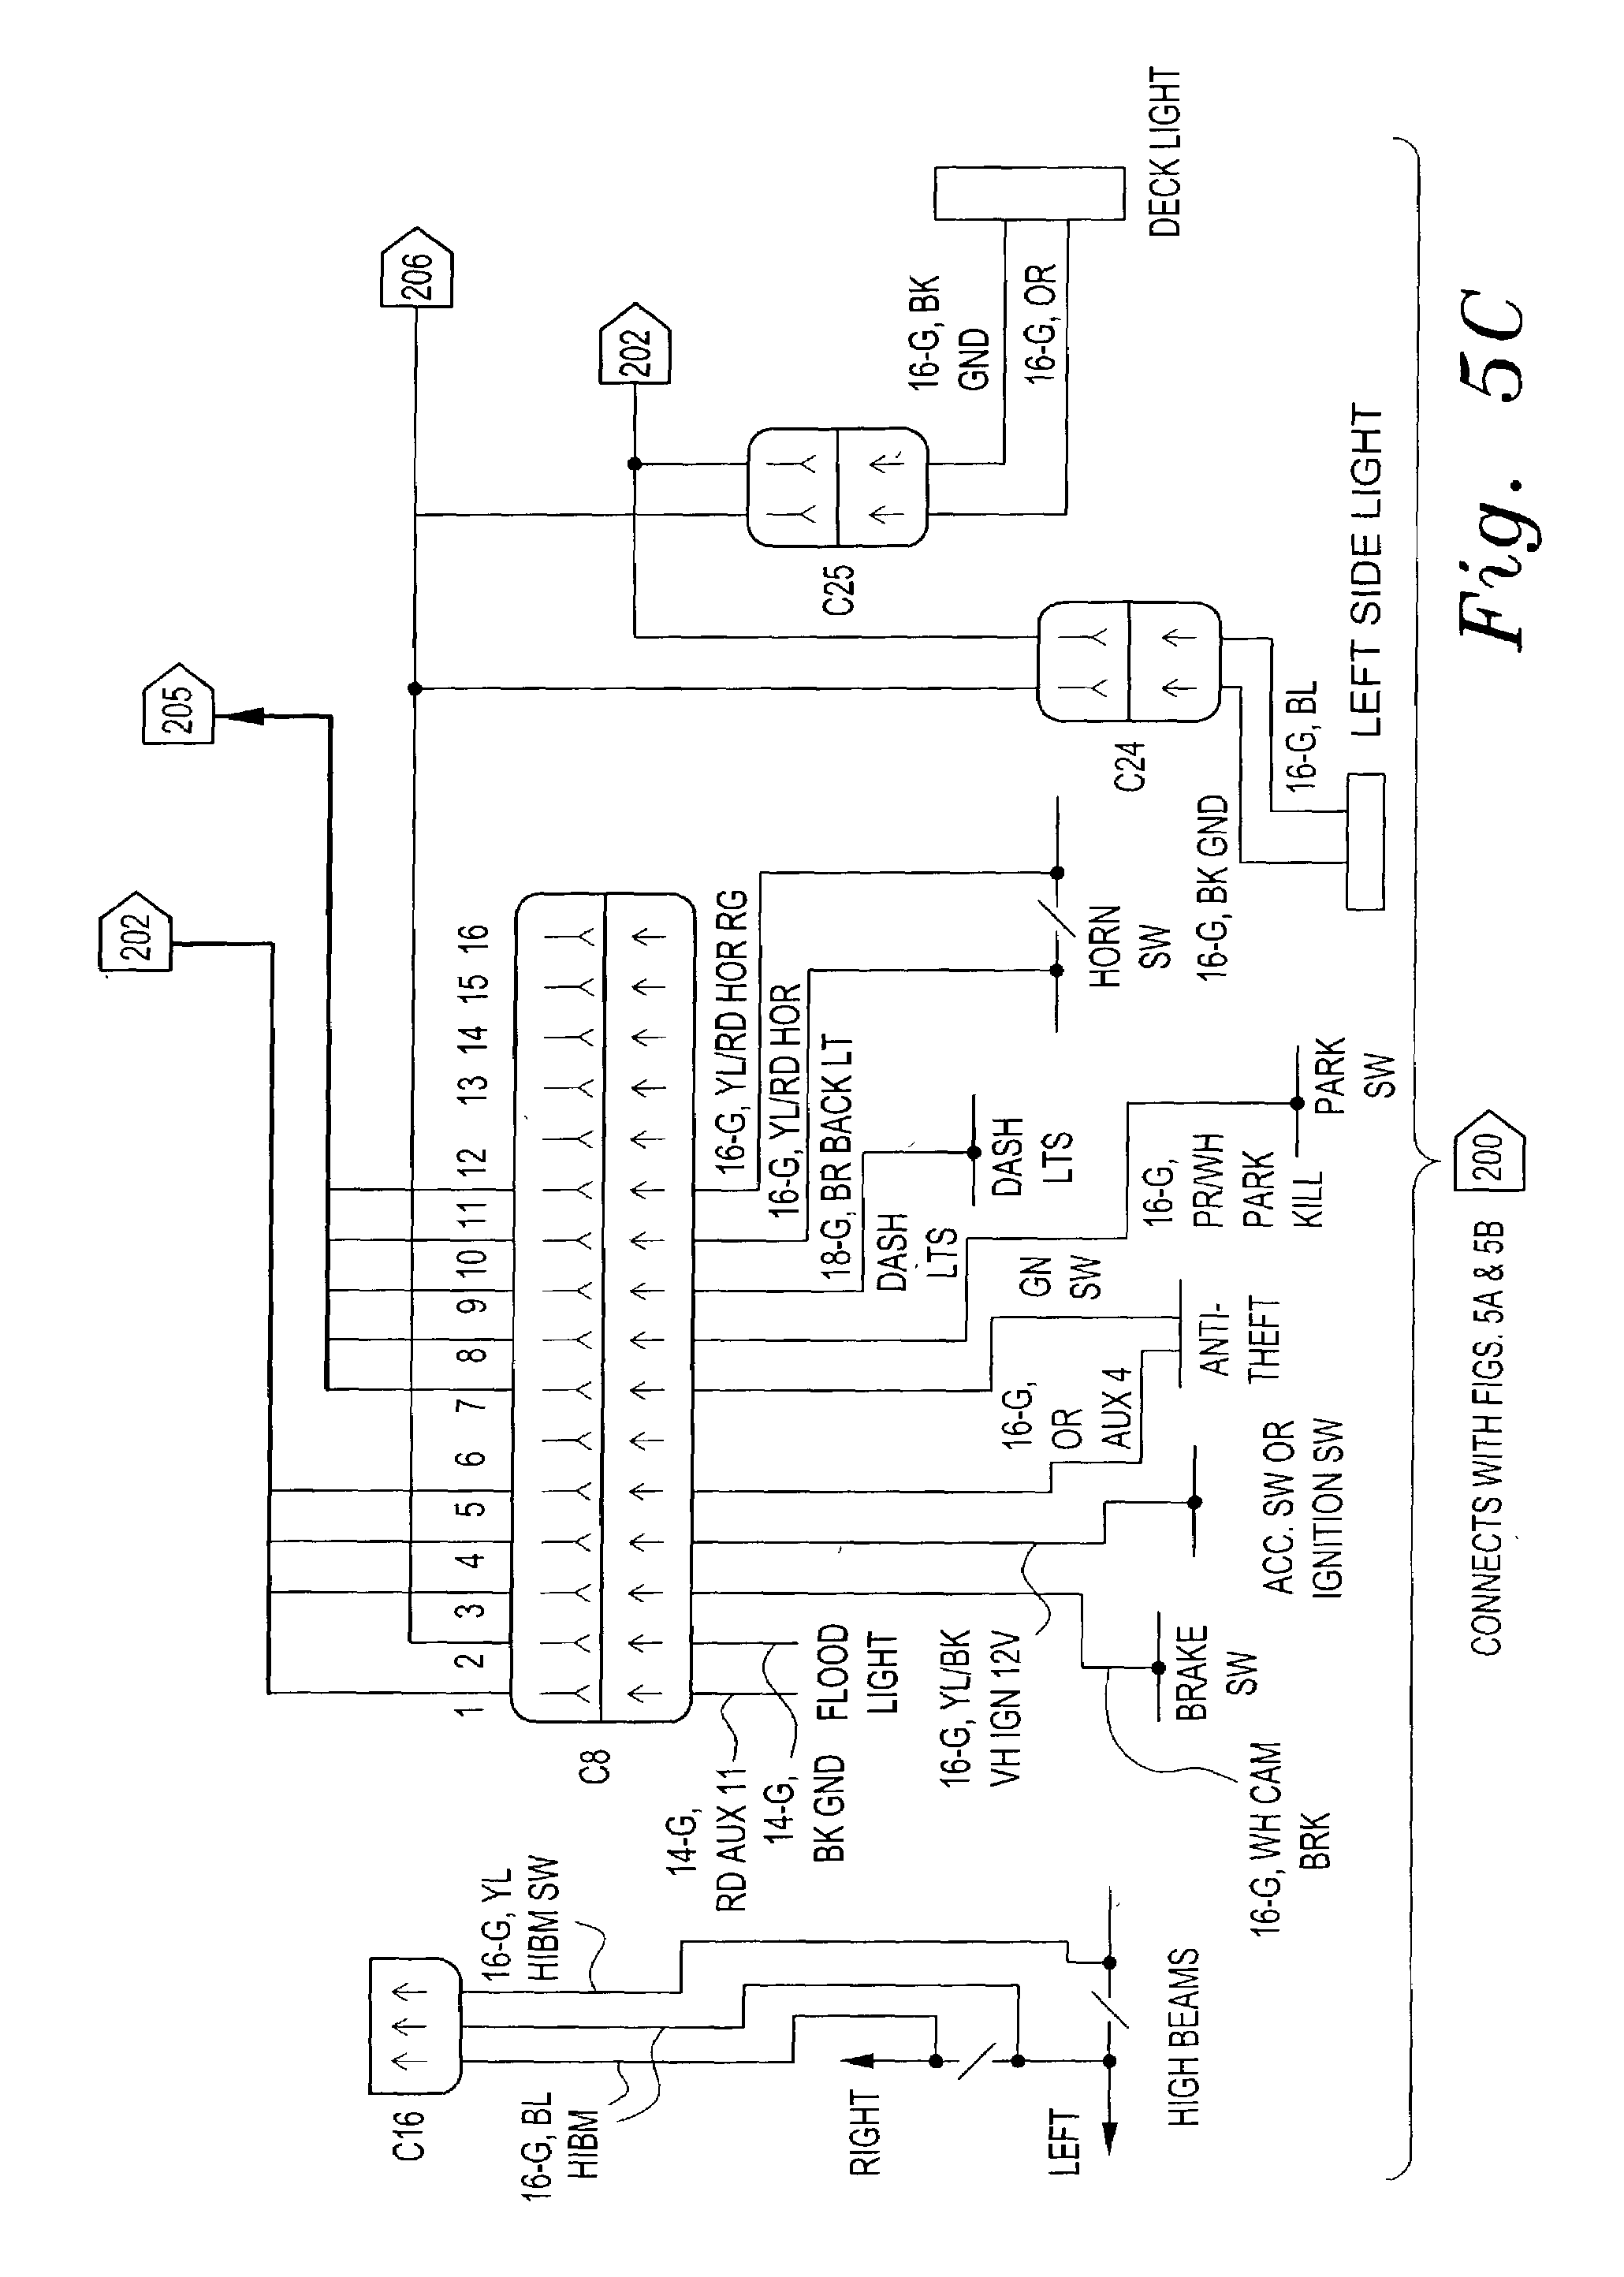 Mx 7000 Wiring Diagram -Electric Choke Wiring Diagram 84 Caprice | Begeboy Wiring  Diagram Source | Mx7000 Light Bar Wiring Diagram |  | Begeboy Wiring Diagram Source